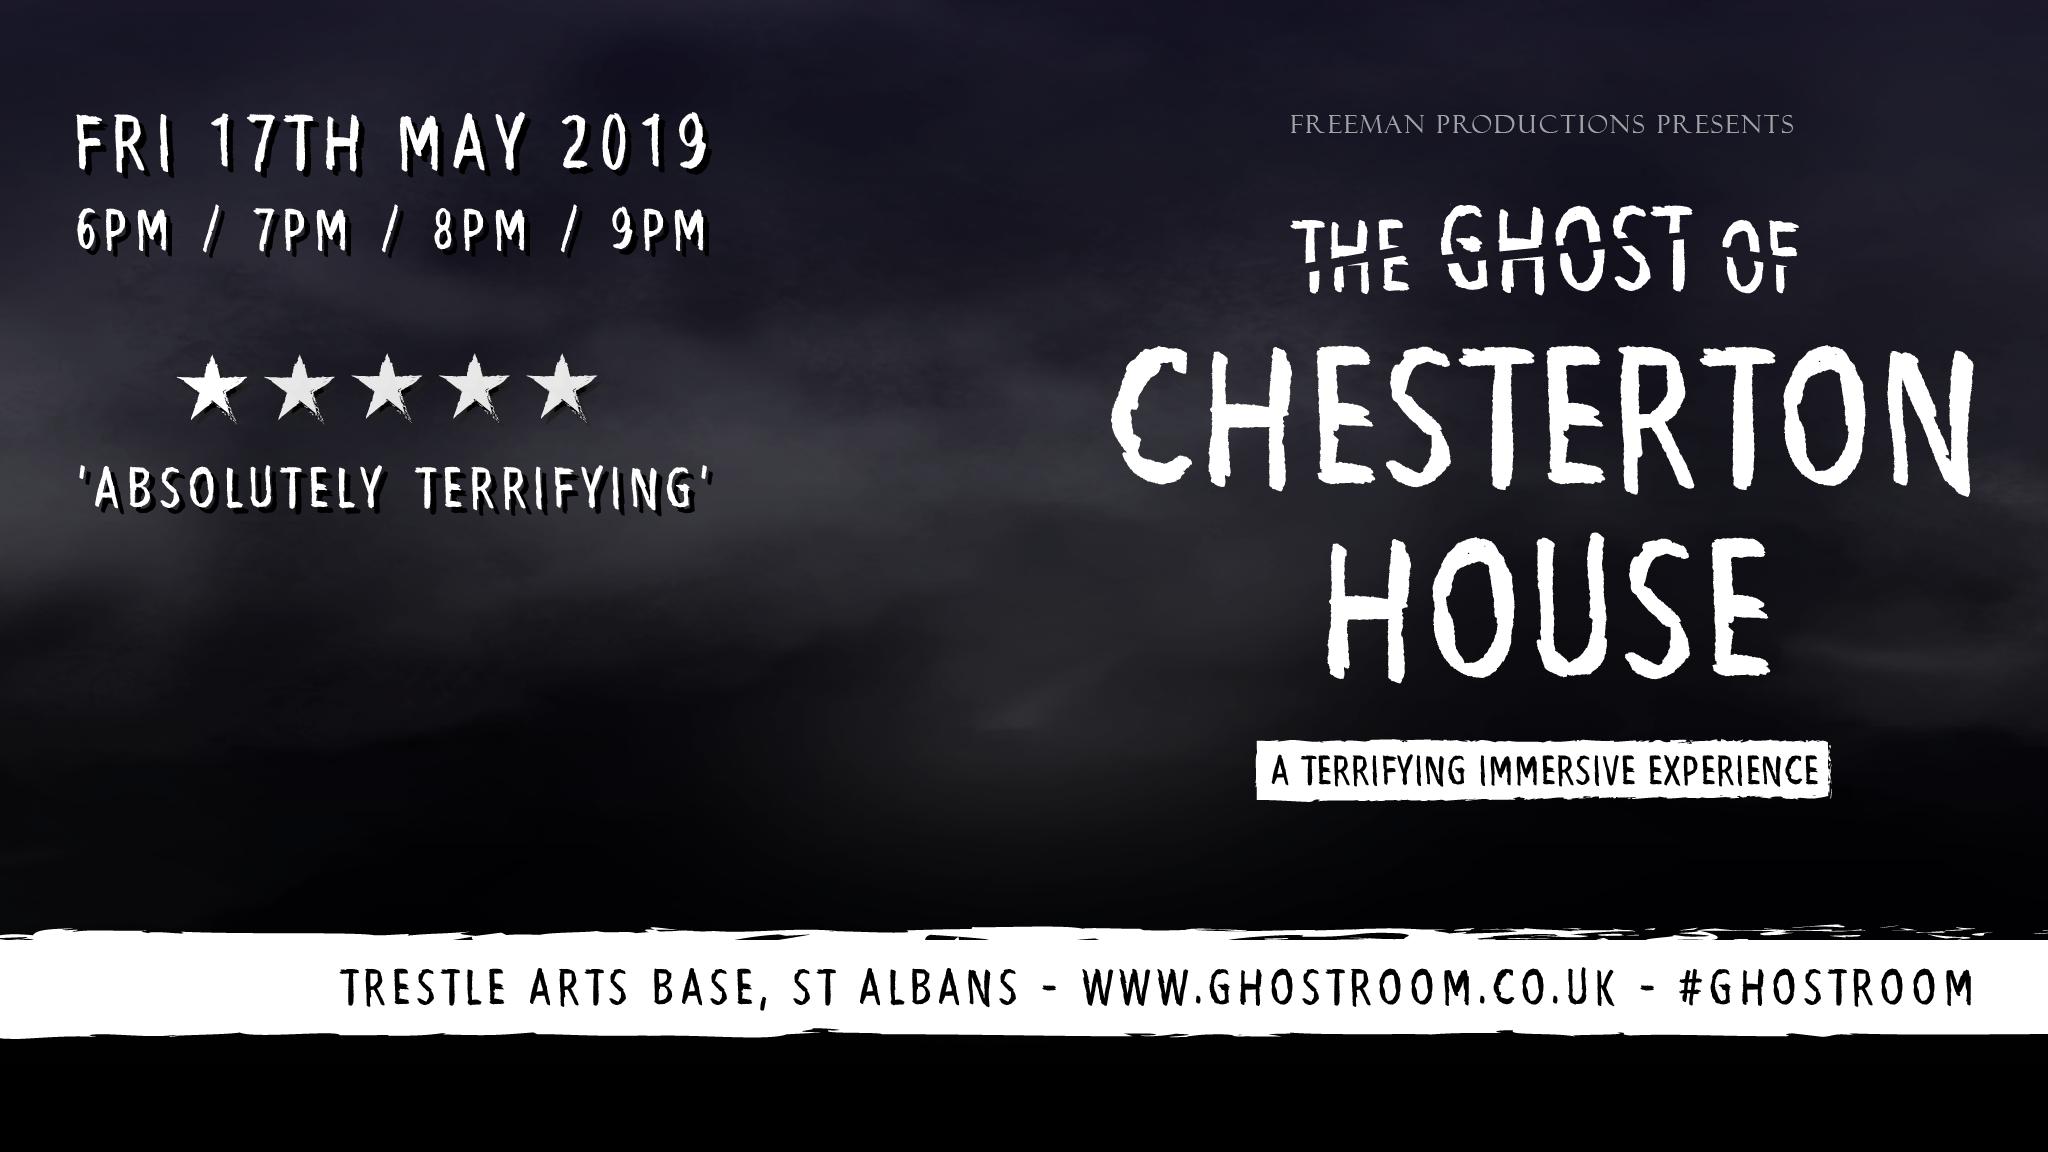 TGOCH Facebook Event Banner - Trestle Arts Base, St Albans - 19-02-19 - Copy.png